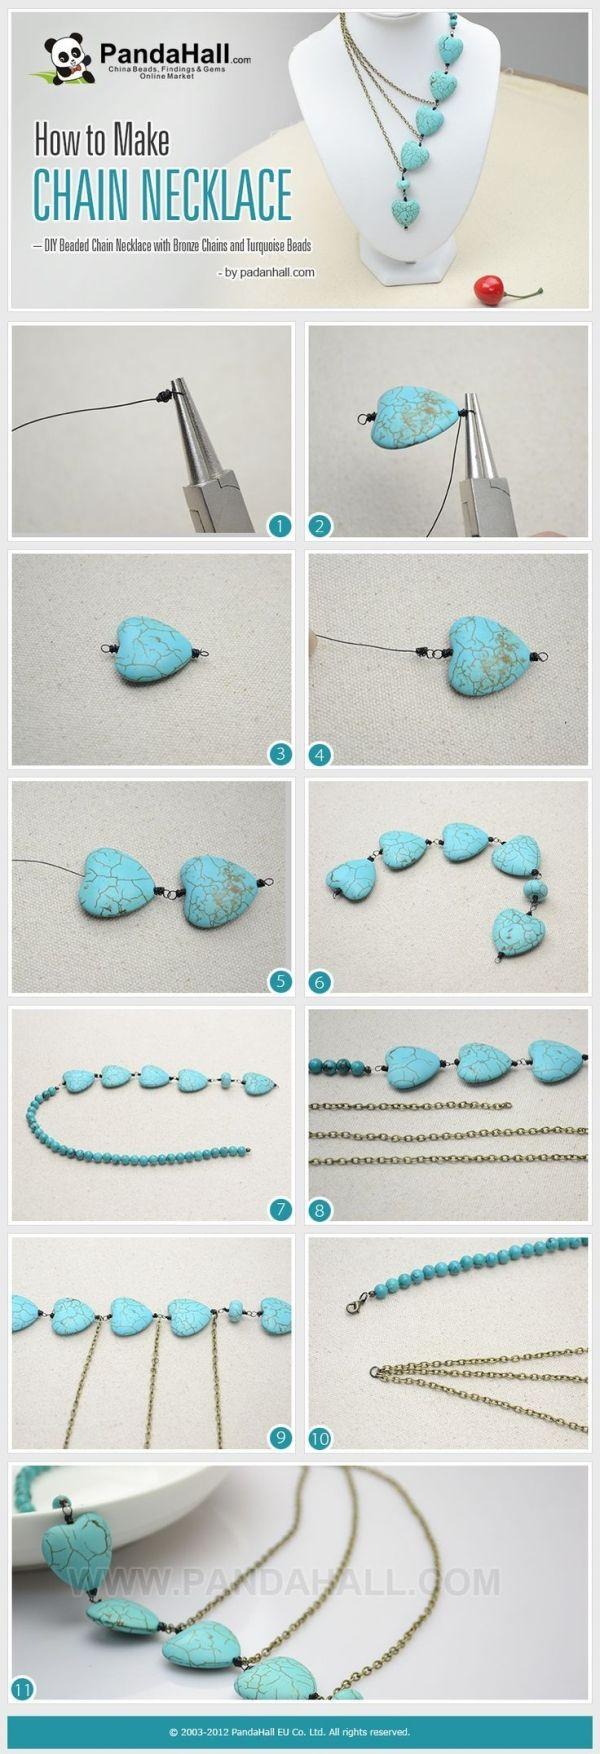 jewelry making tutorials: How to Make Chain Necklace - DIY Beaded Chain ... | Jewelry Making Tu… - DIY Refashion by Stoeps